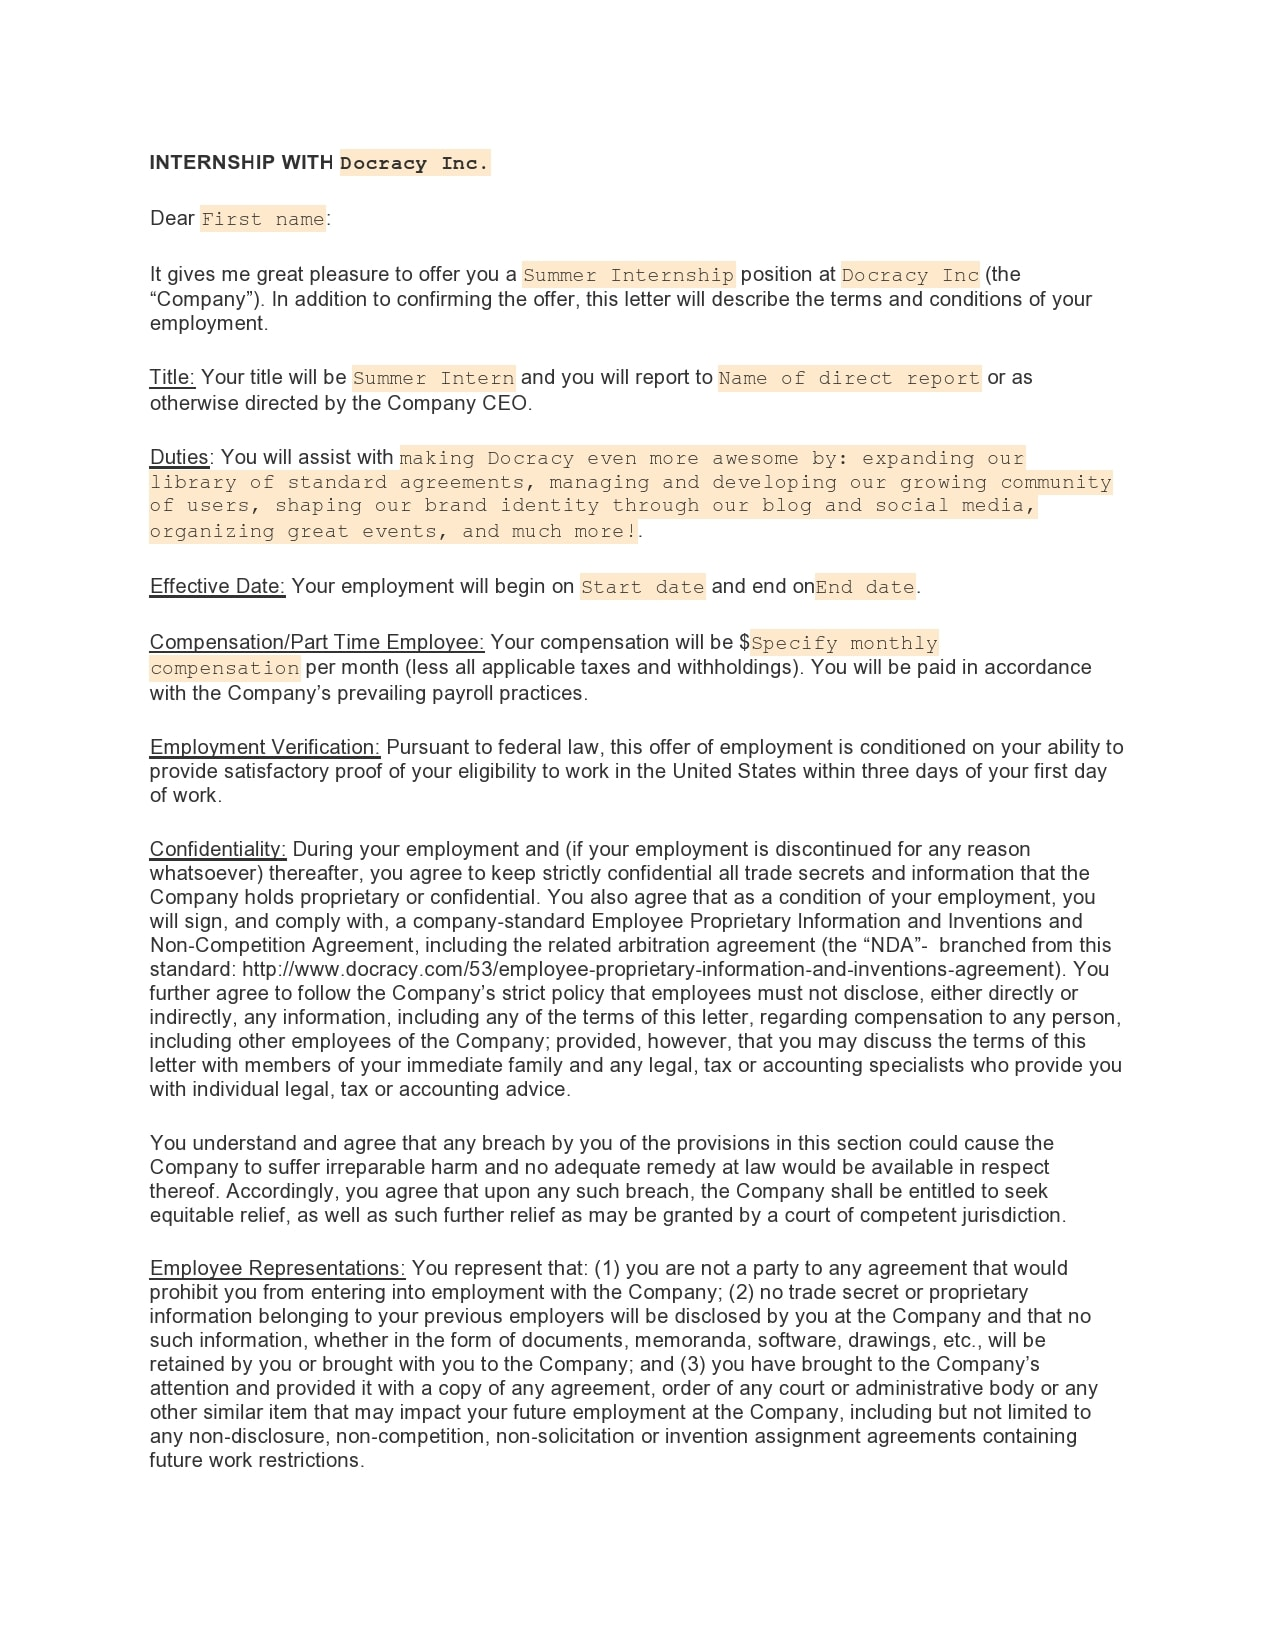 internship offer letter 28